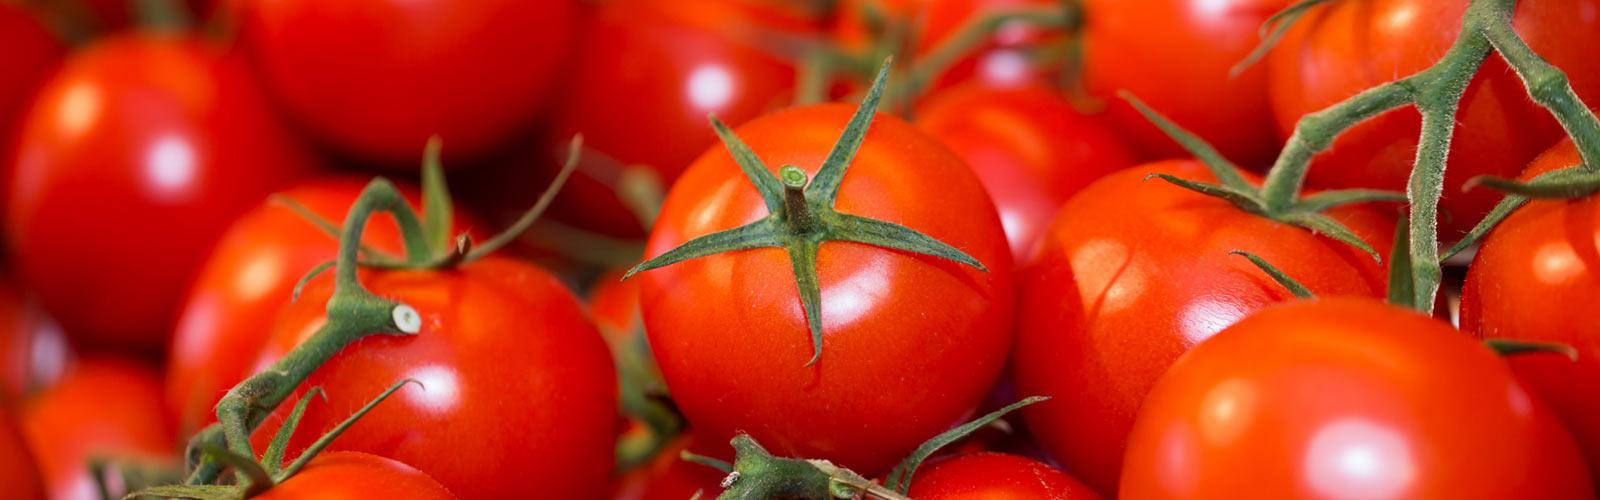 sl-Tomaten